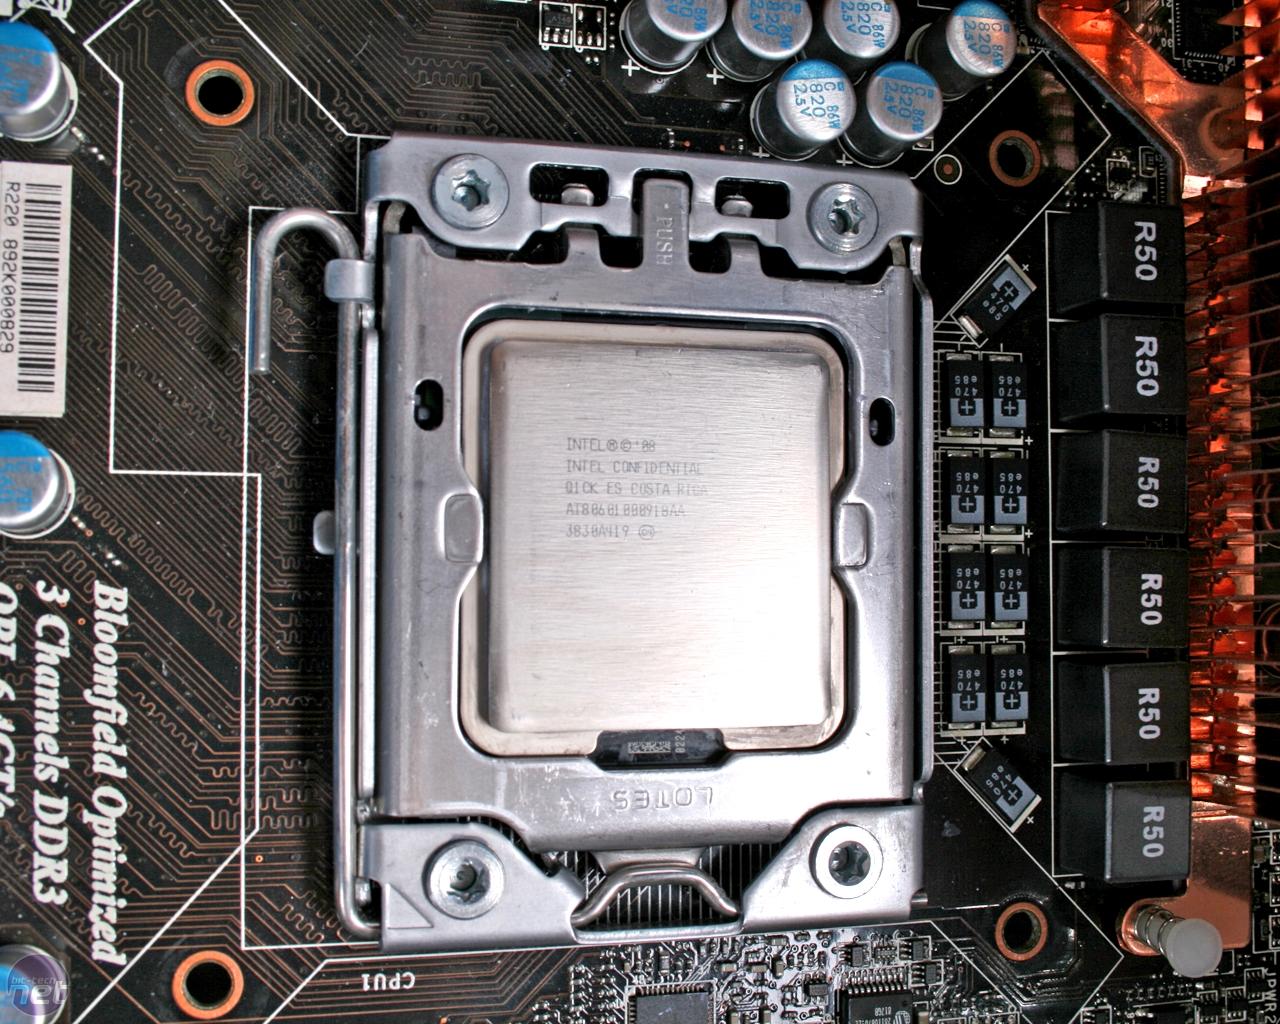 Gigabyte G1. Sniper Intel Core i7 LGA 1366 X58 Motherboard